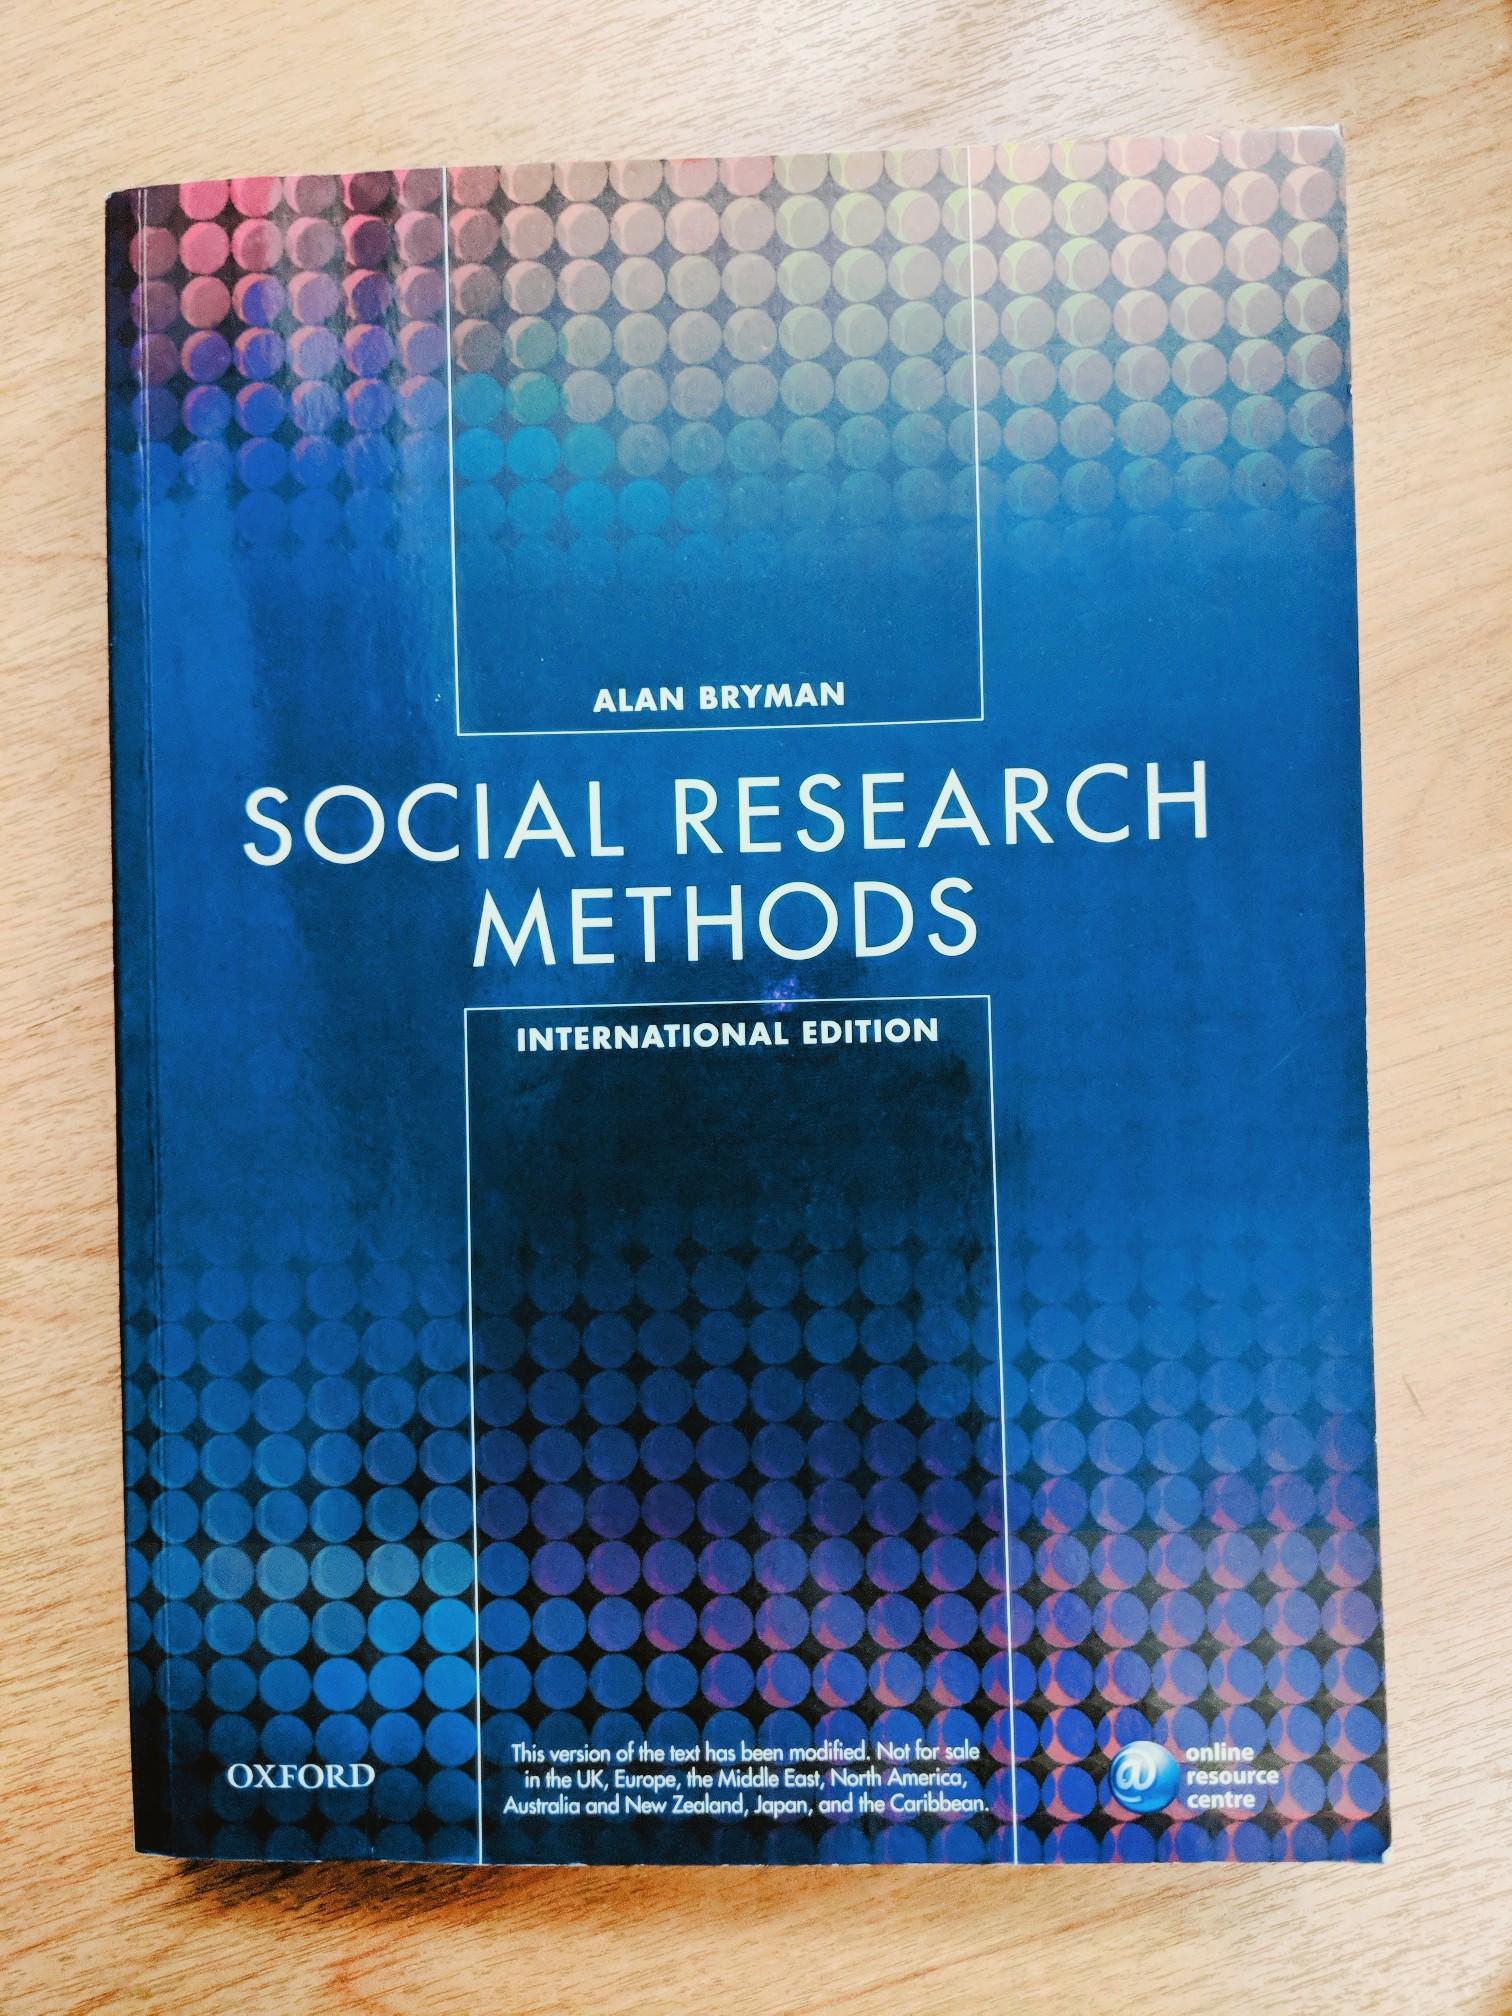 NM2104 Alarn Bryman Social Research Methods